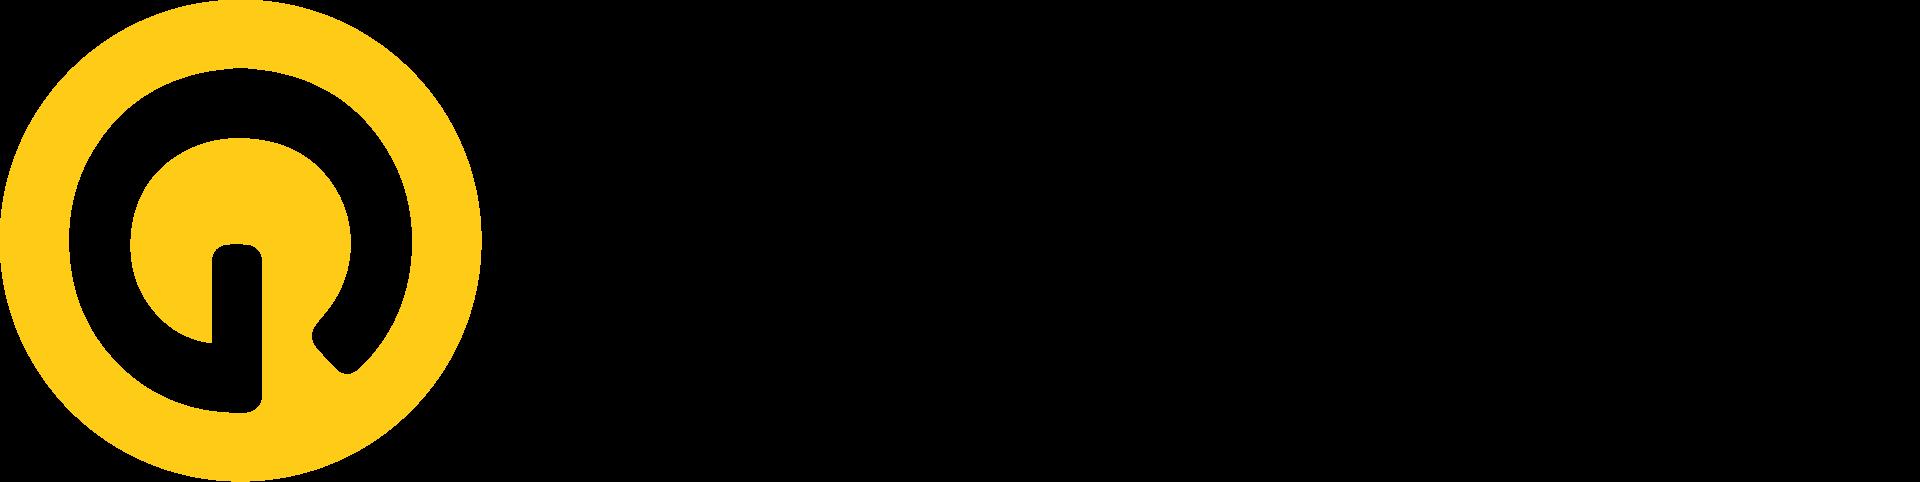 logo intero glocally@1920x